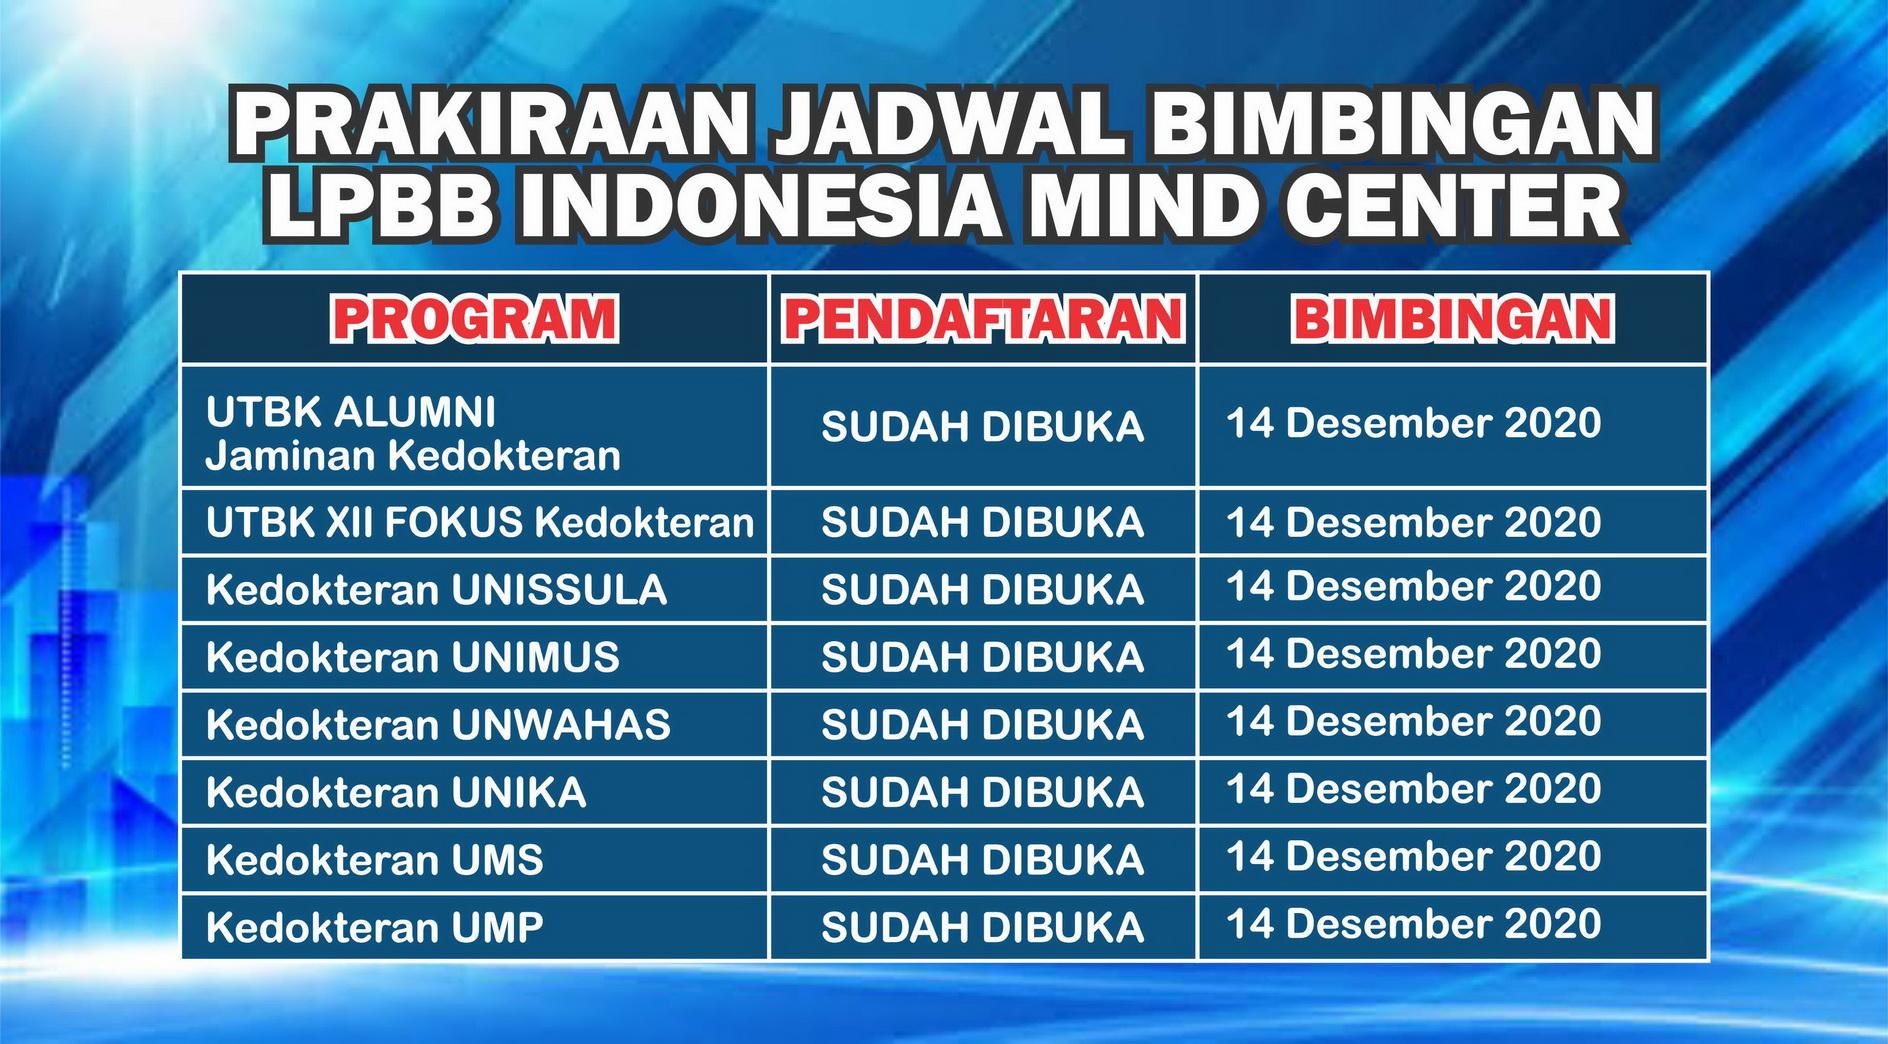 Anggrek Cctv Semarang godean.web.id